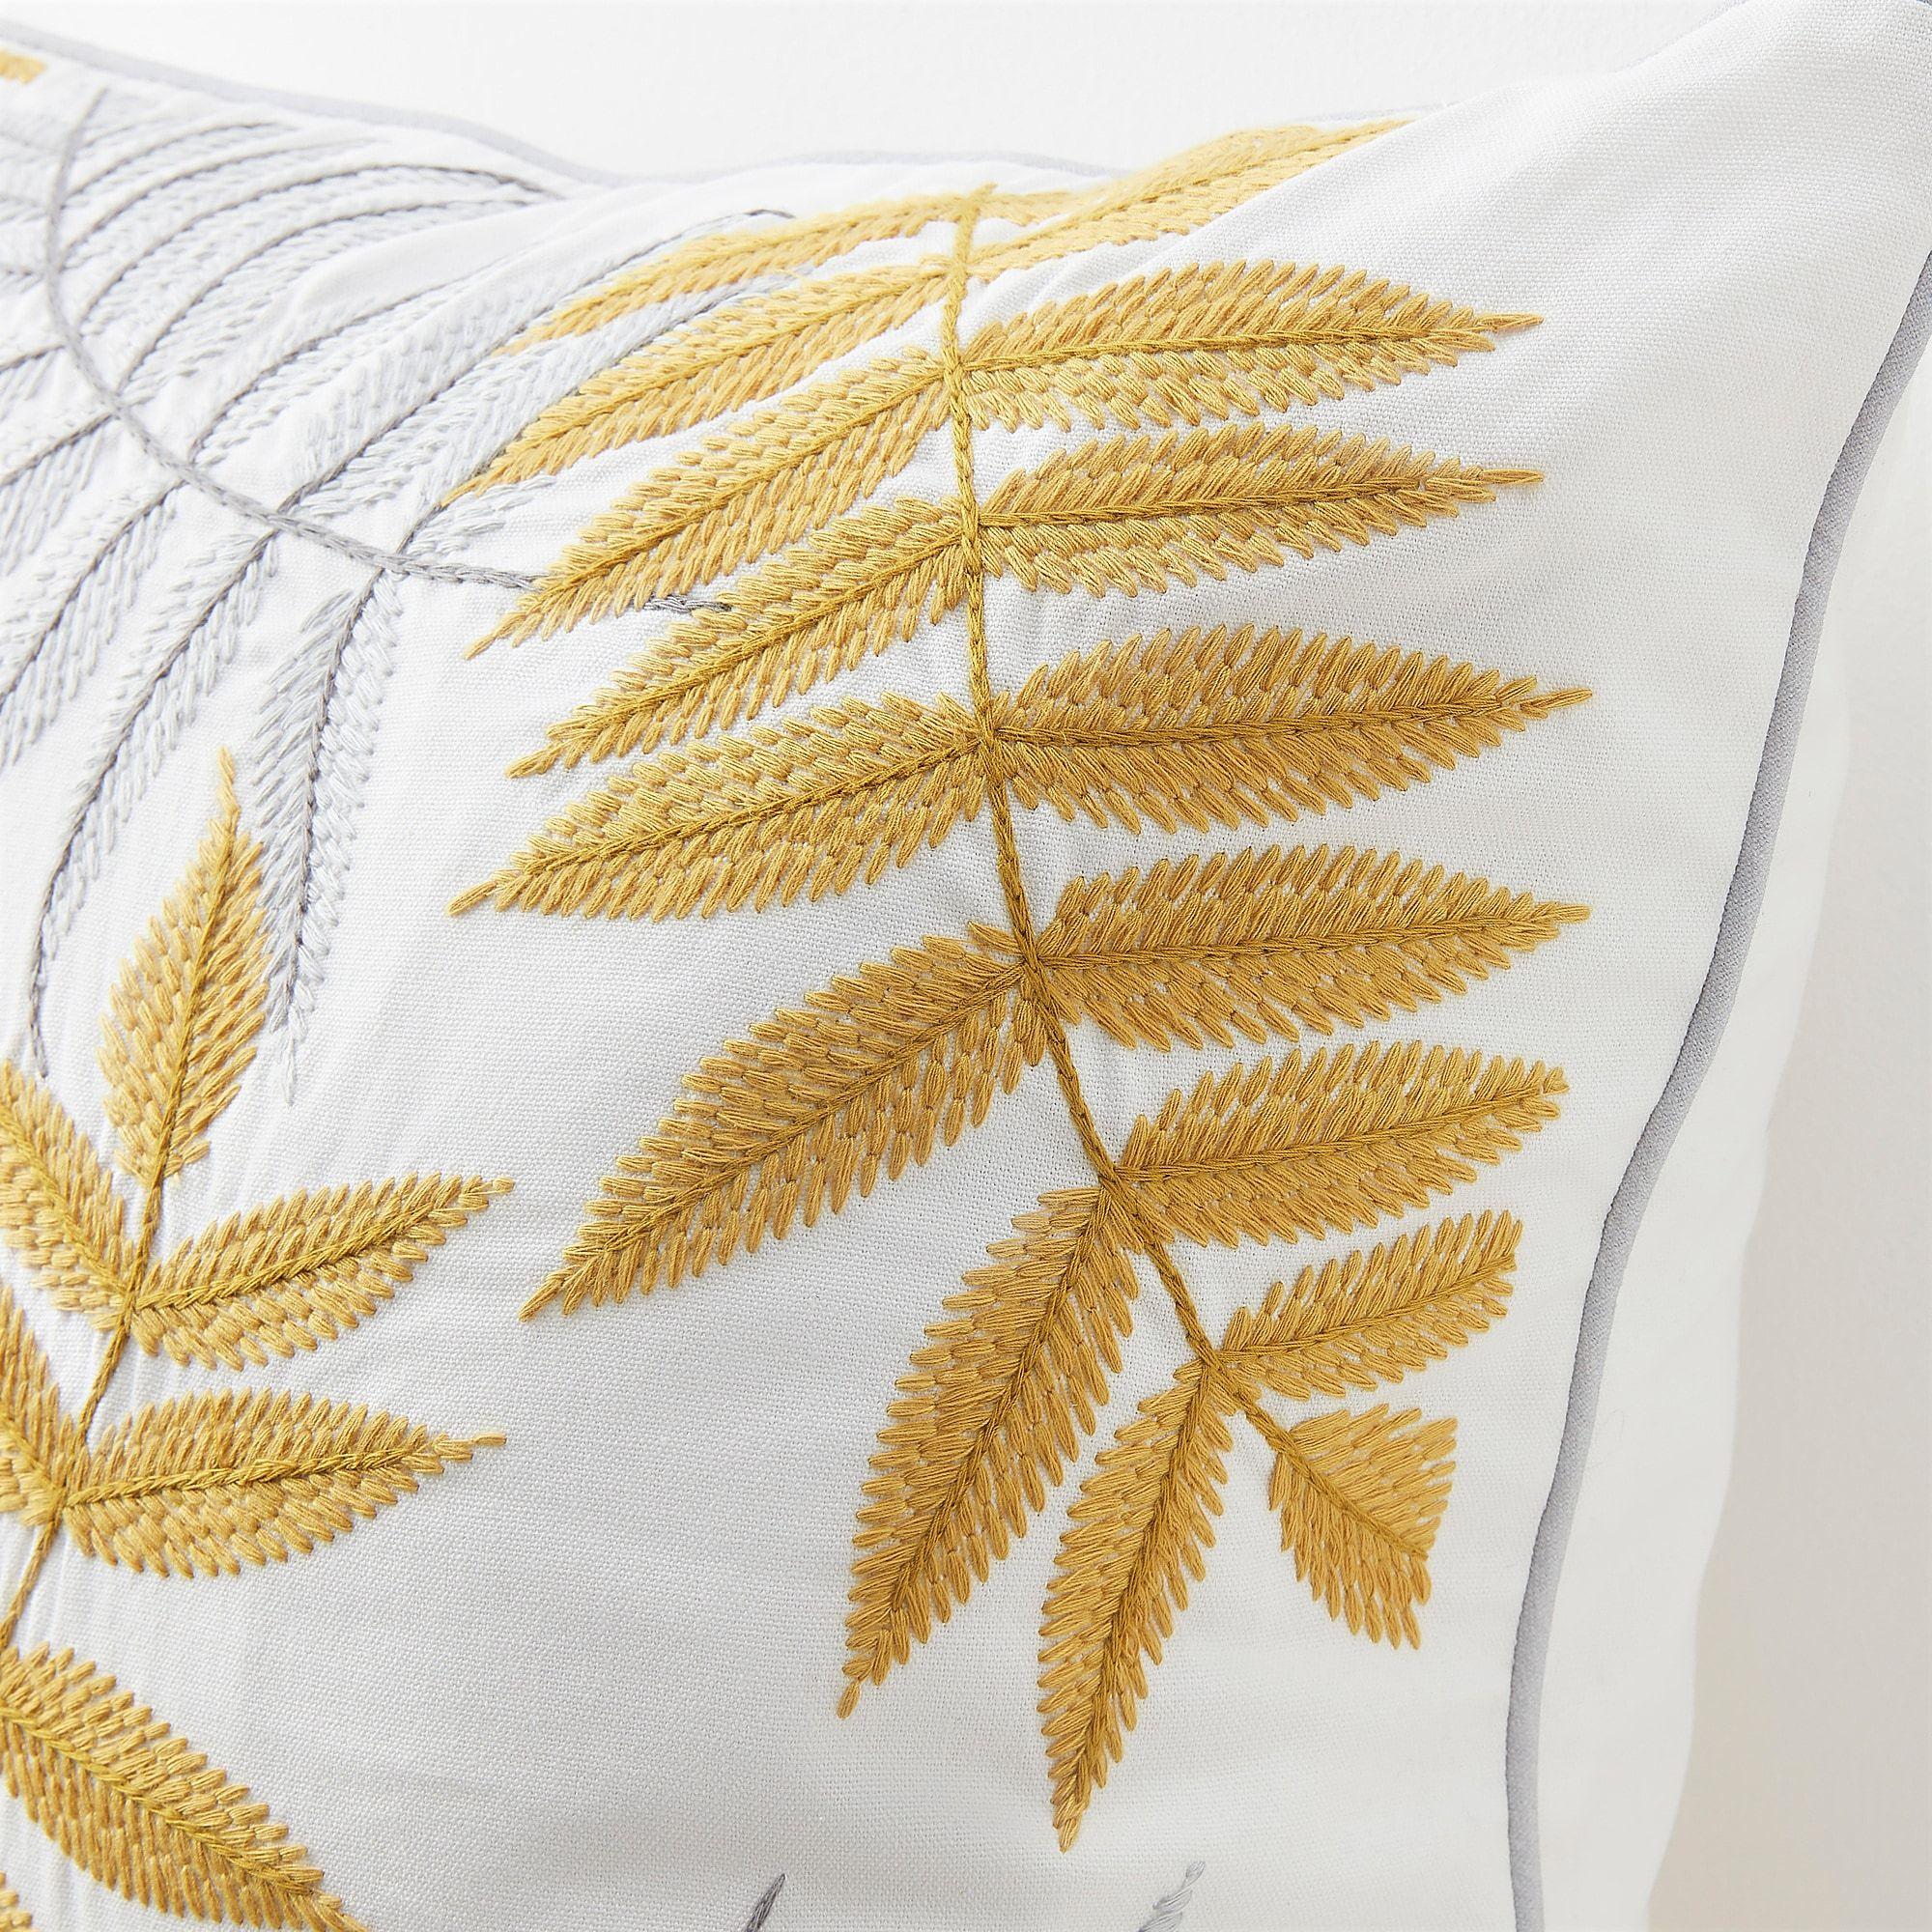 Backklover Kissenbezug Blatt Gelb Grau Ikea Osterreich